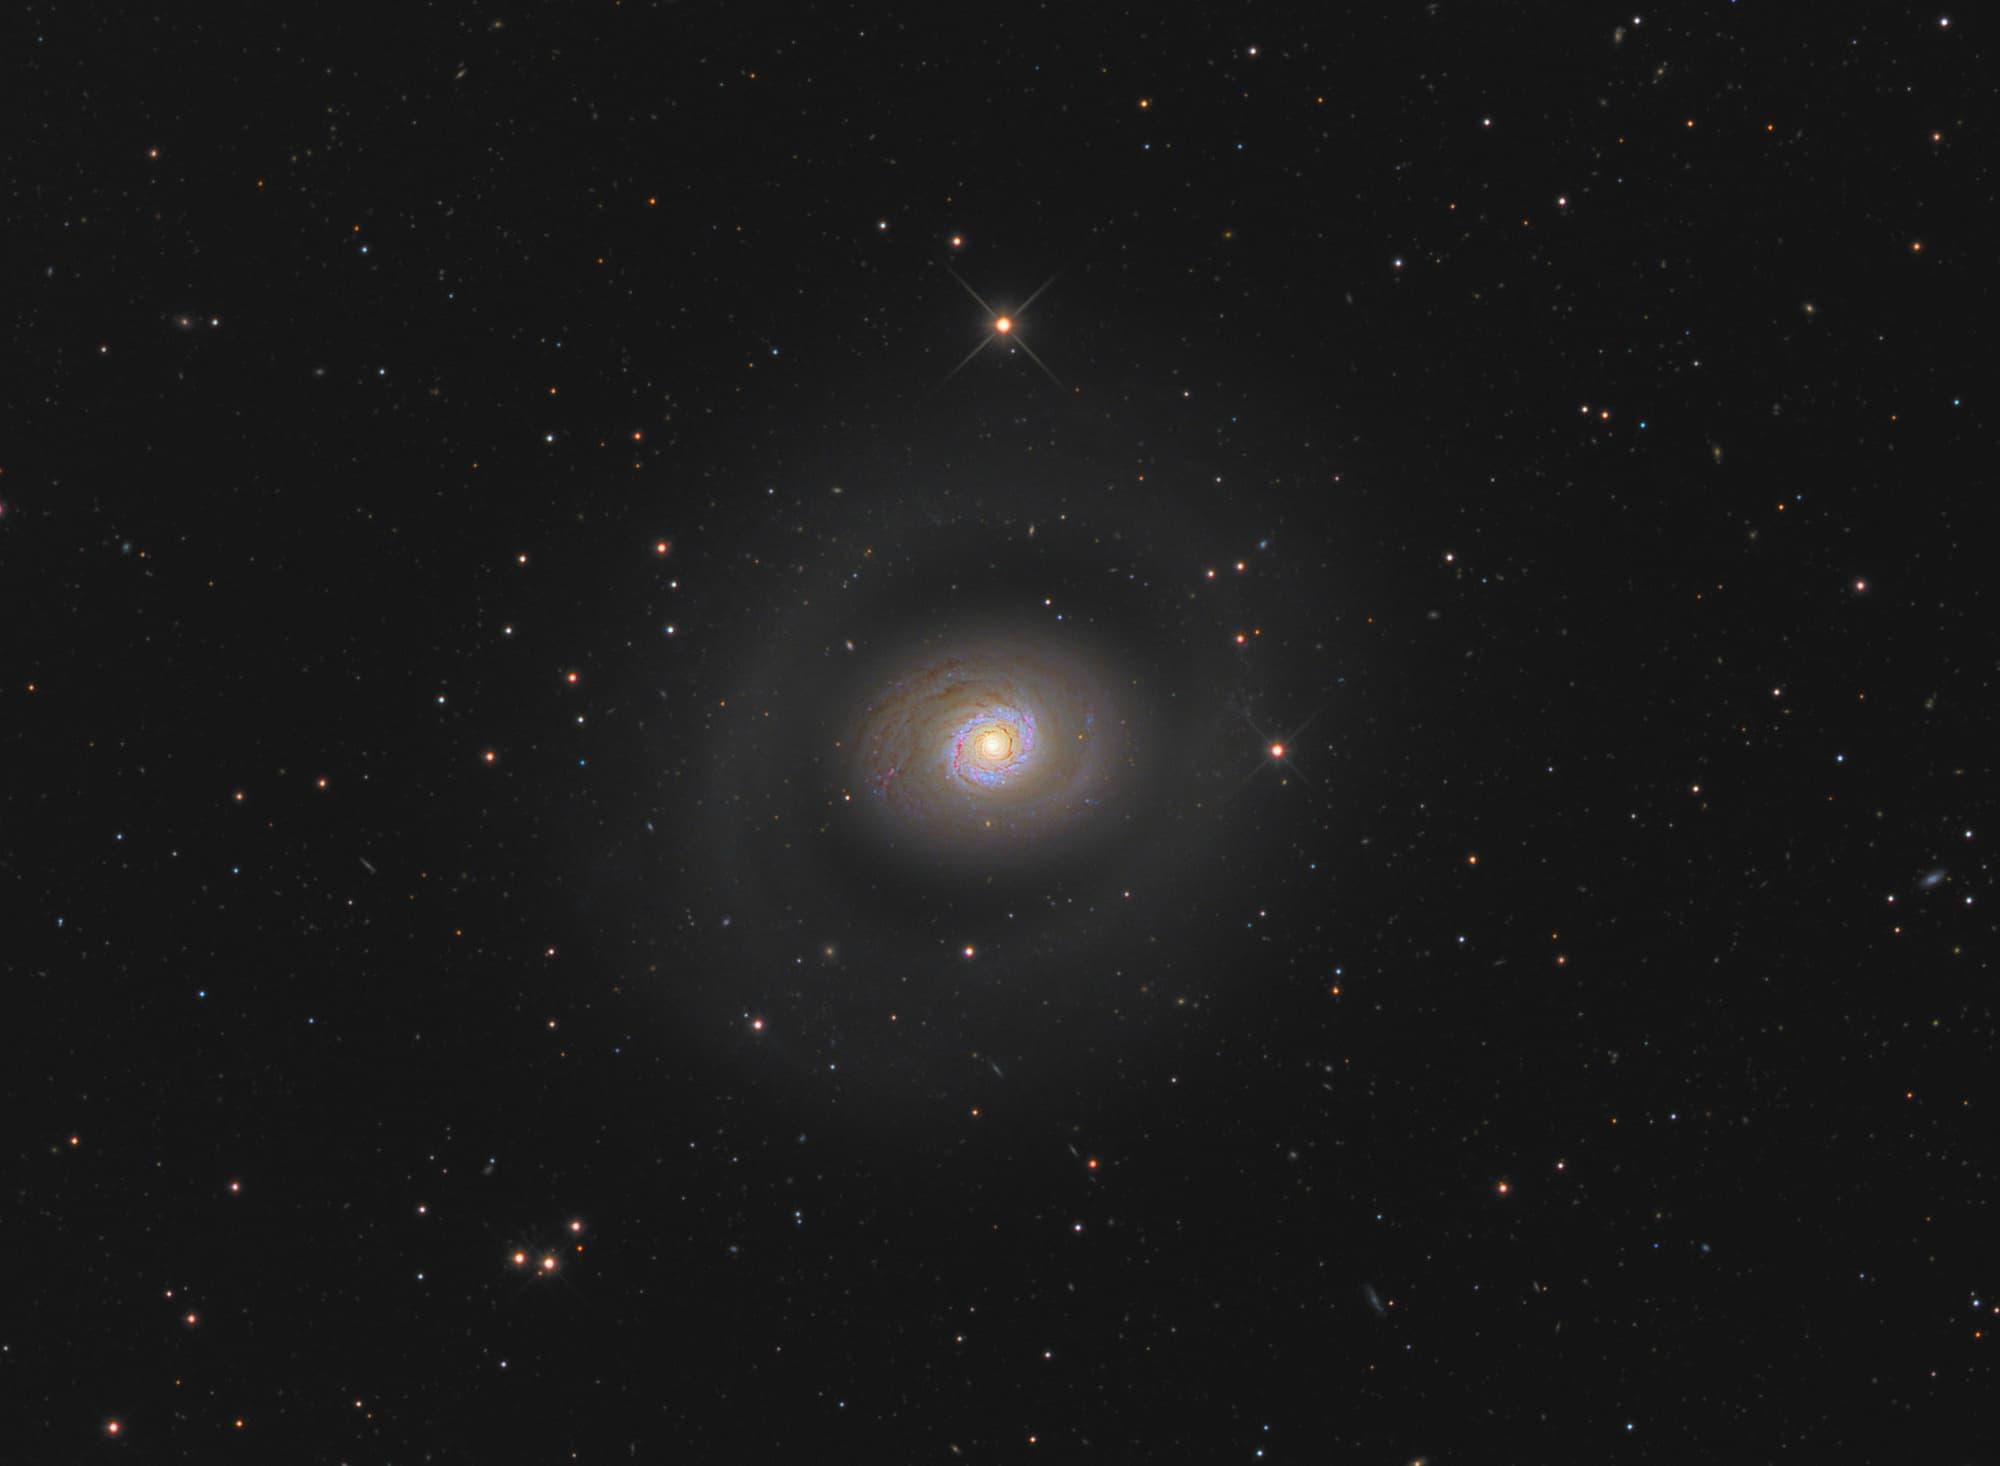 Messier 94 im Detail